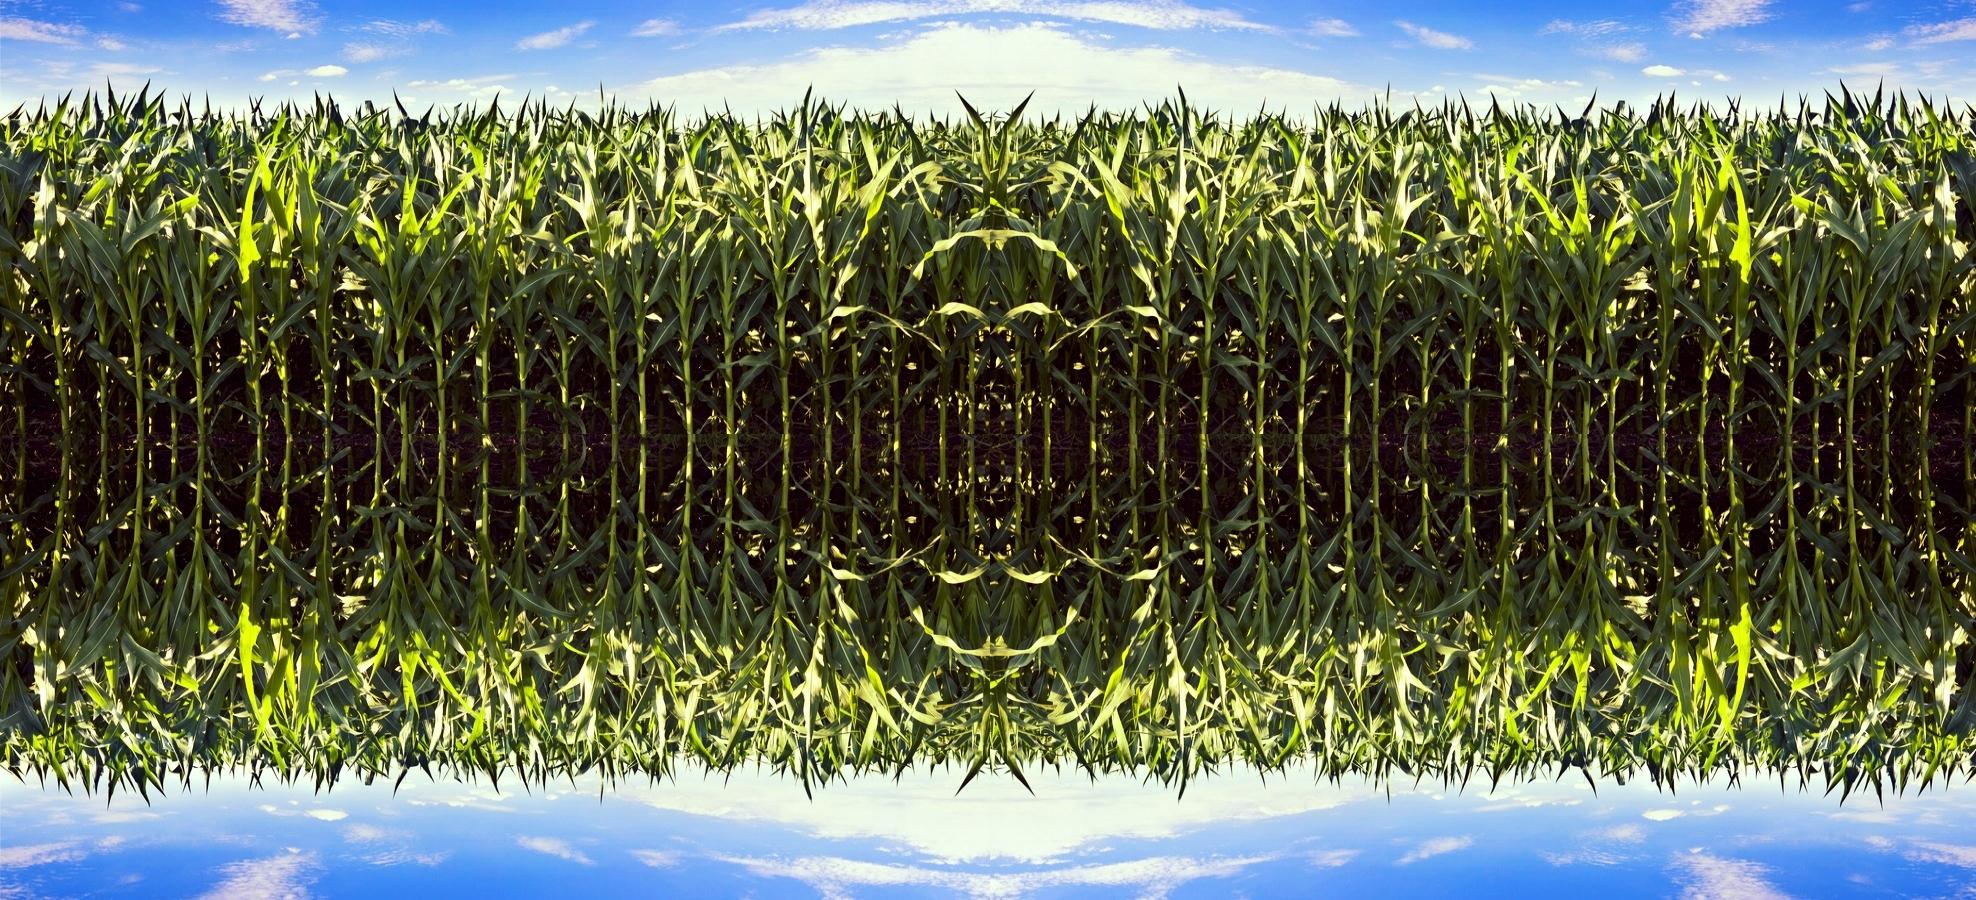 shutterstock_150154451.jpg